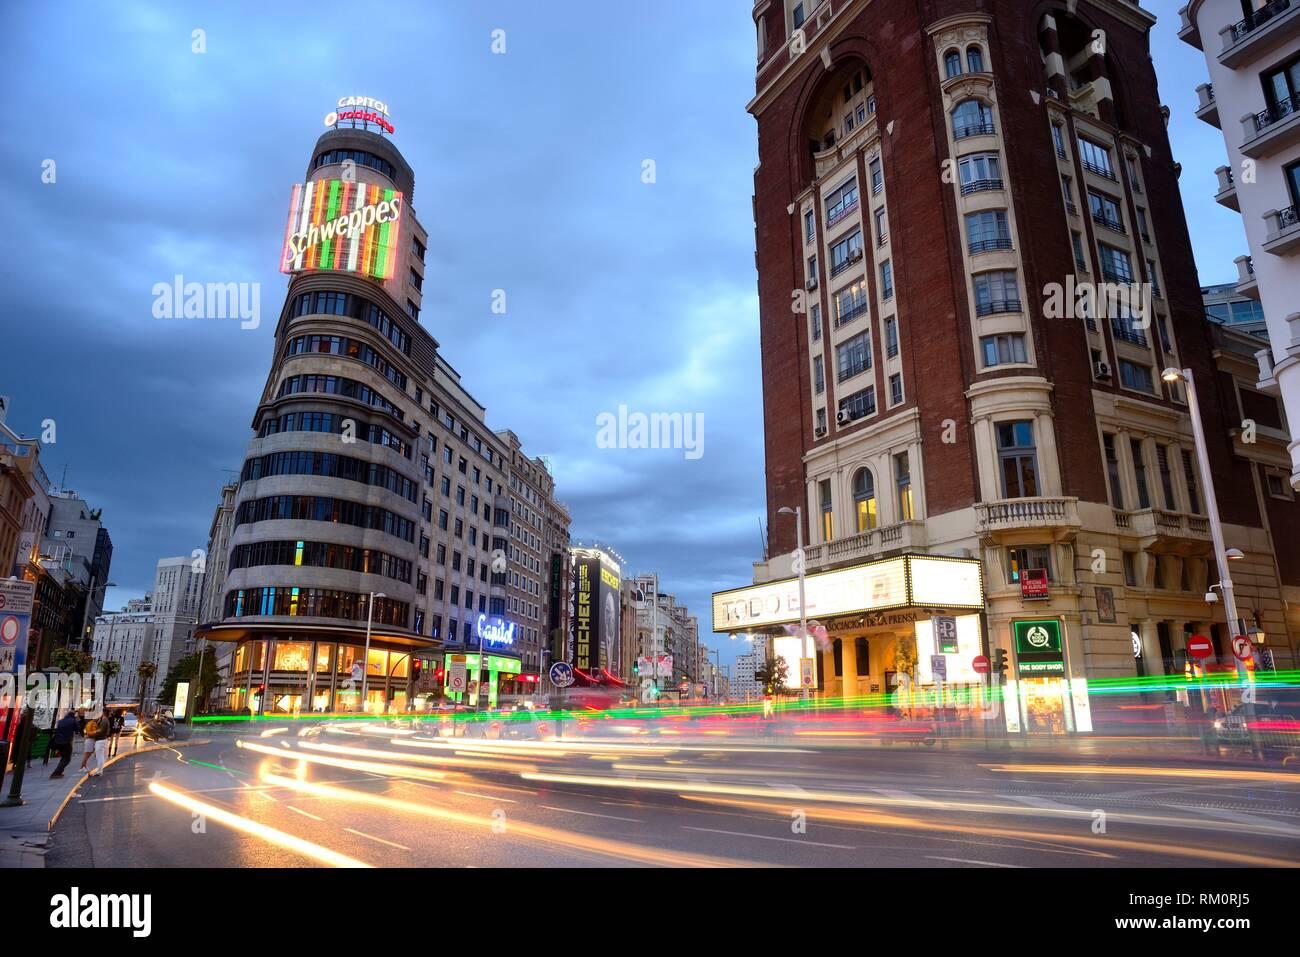 Bâtiments dans la rue Gran Via, Madrid, Espagne. Photo Stock